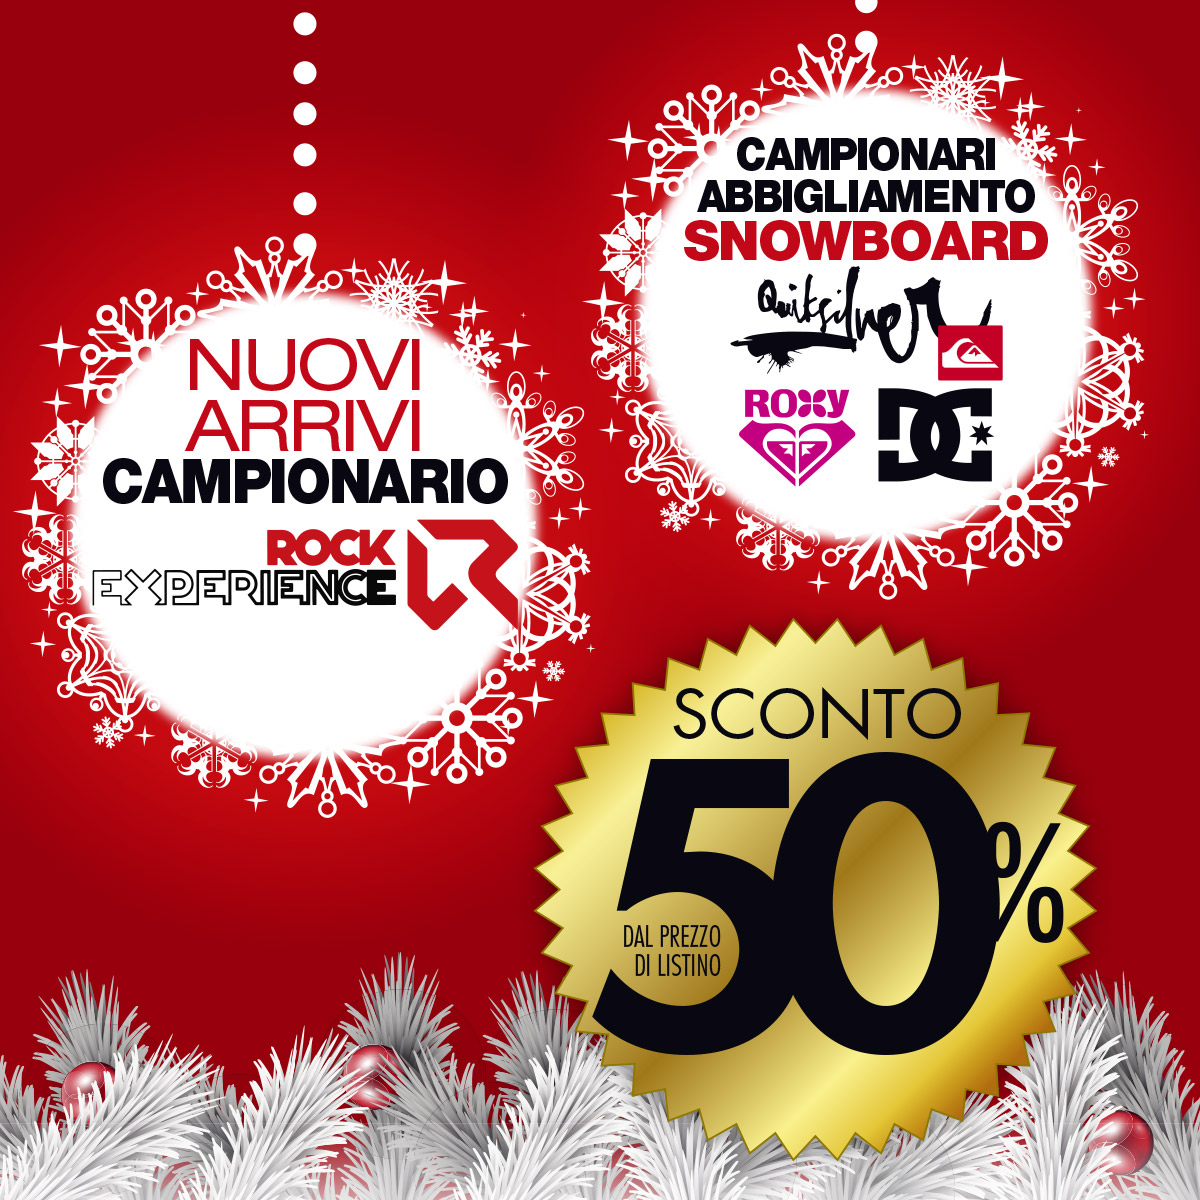 Promo BORGO CAMPIONARI Sconto 50